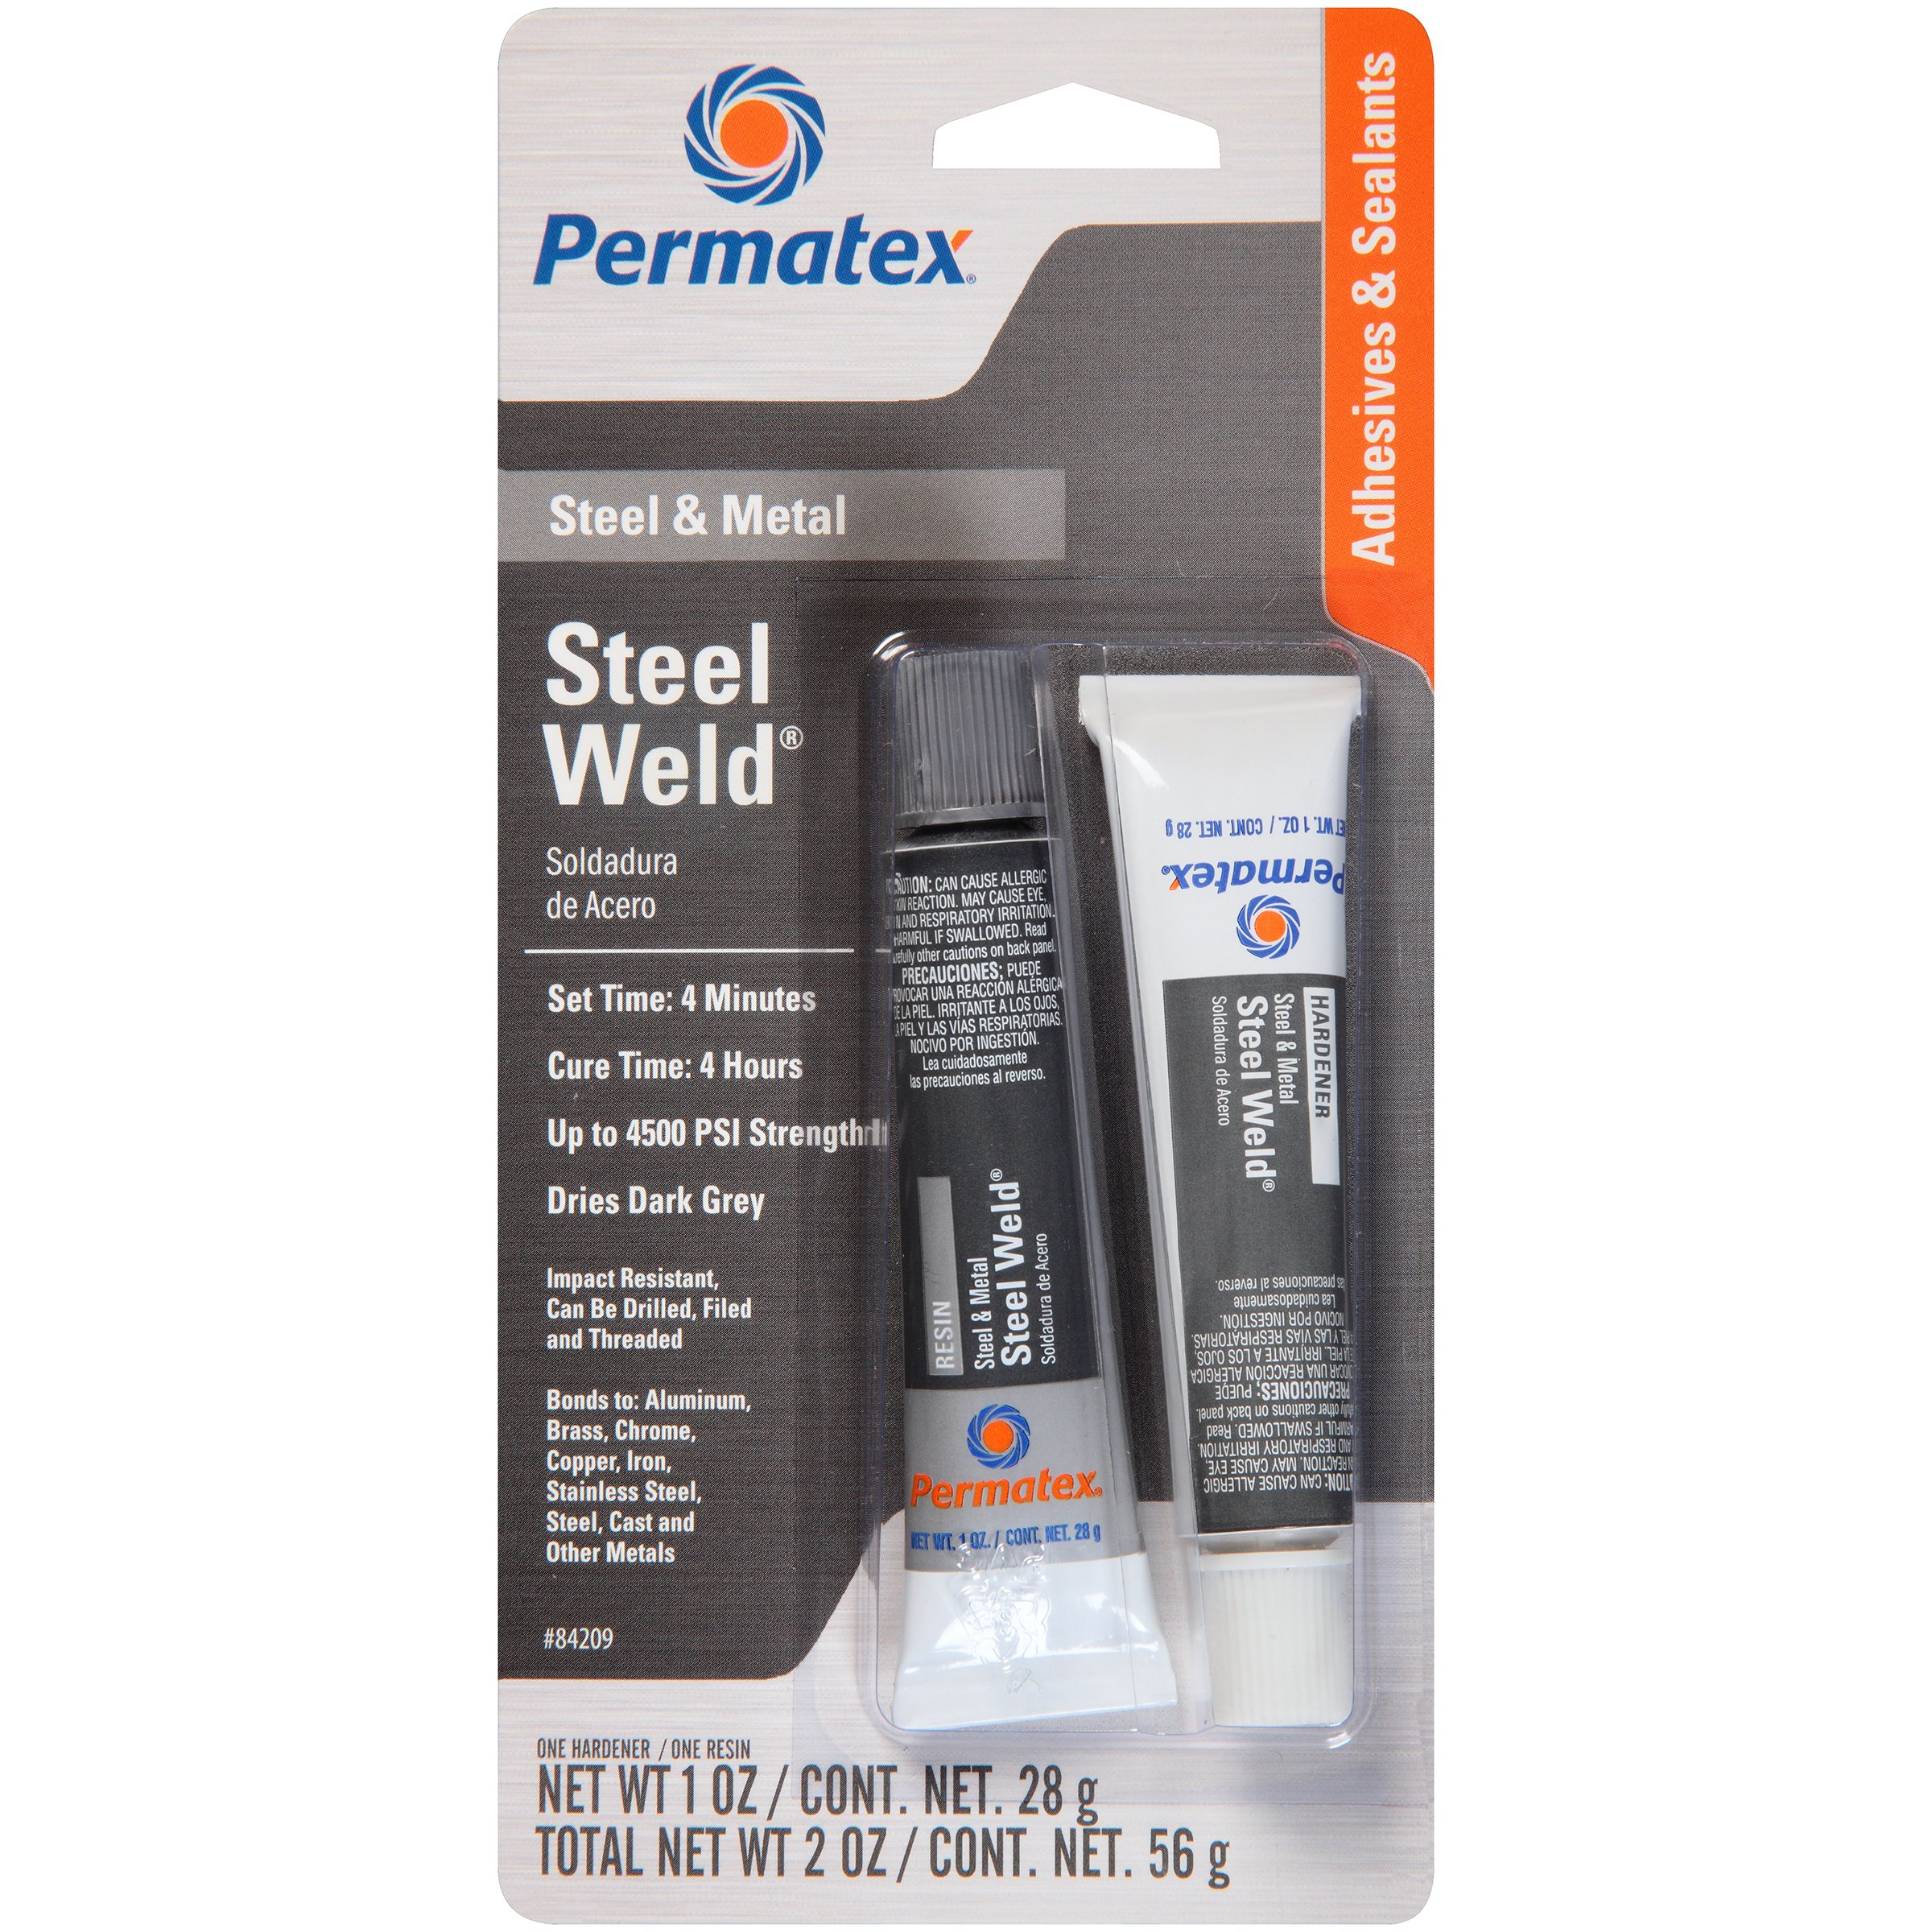 Permatex 84209 PermaPoxy 4-Minute Multi-Metal Epoxy - Two 1 oz. Tubes, (Pack of 12)